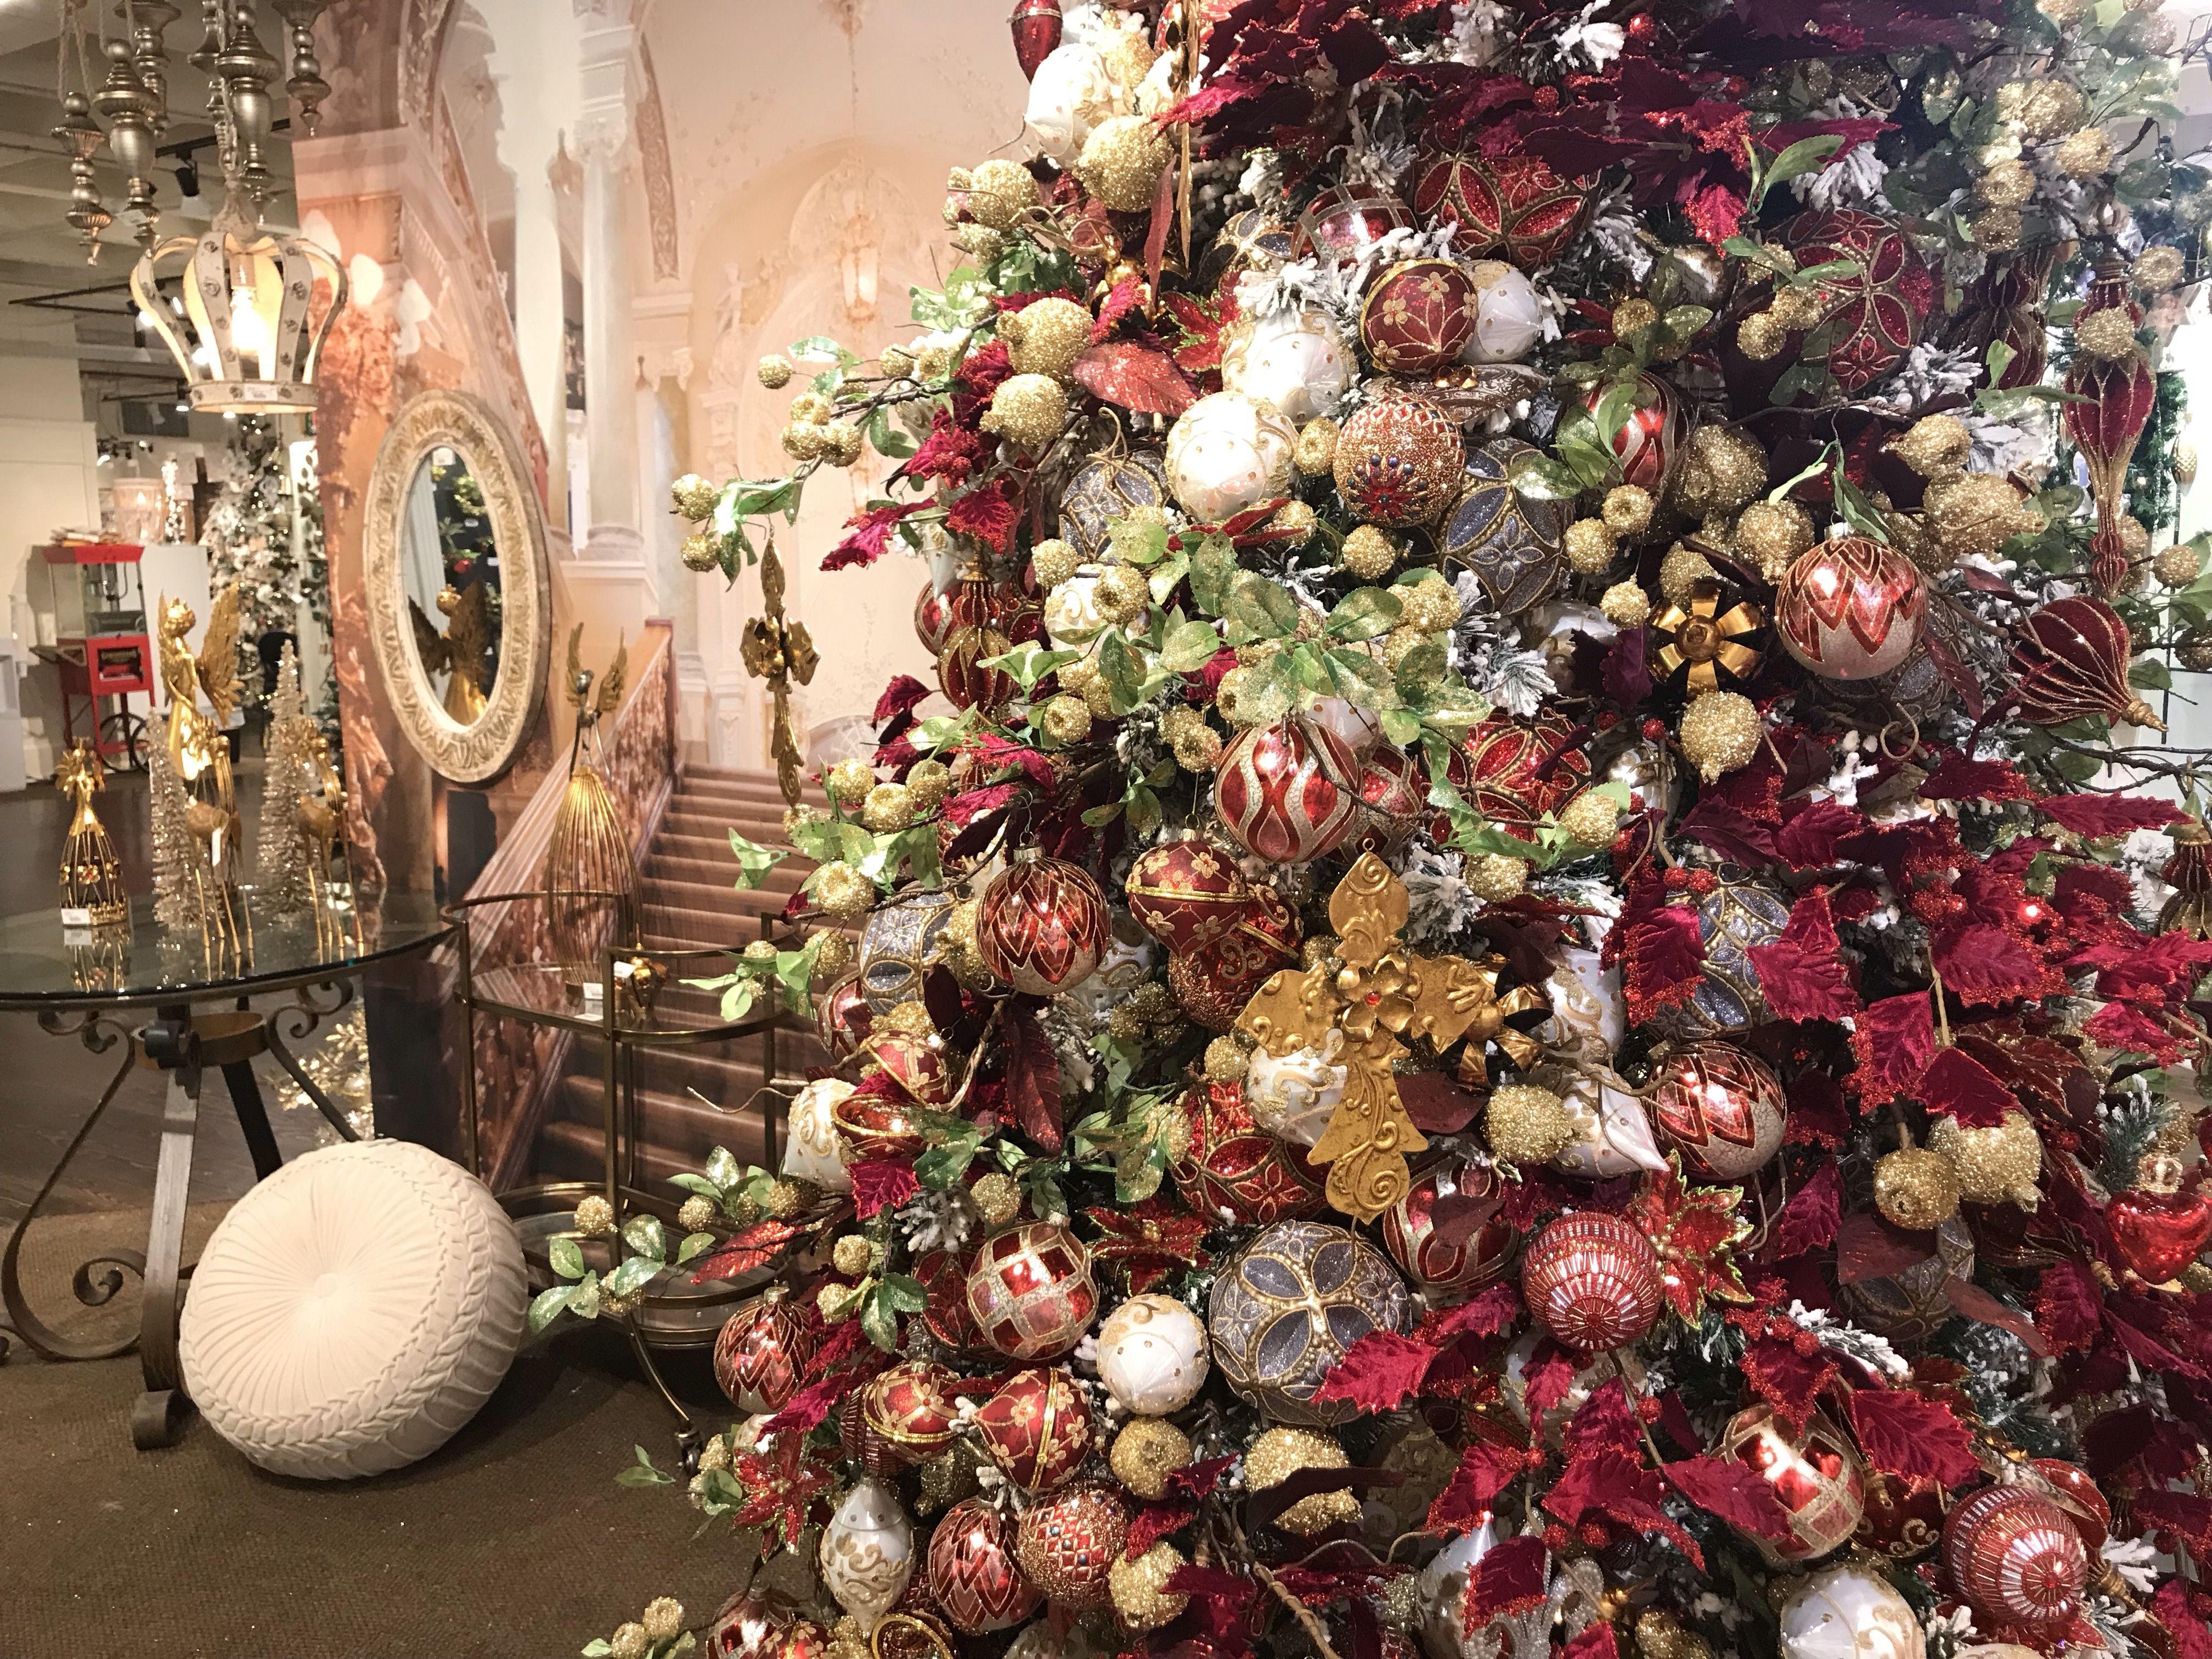 Christmas In Atlanta 2019 Our Kir Royal Christmas Theme   Visual Display. 2019. Atlanta